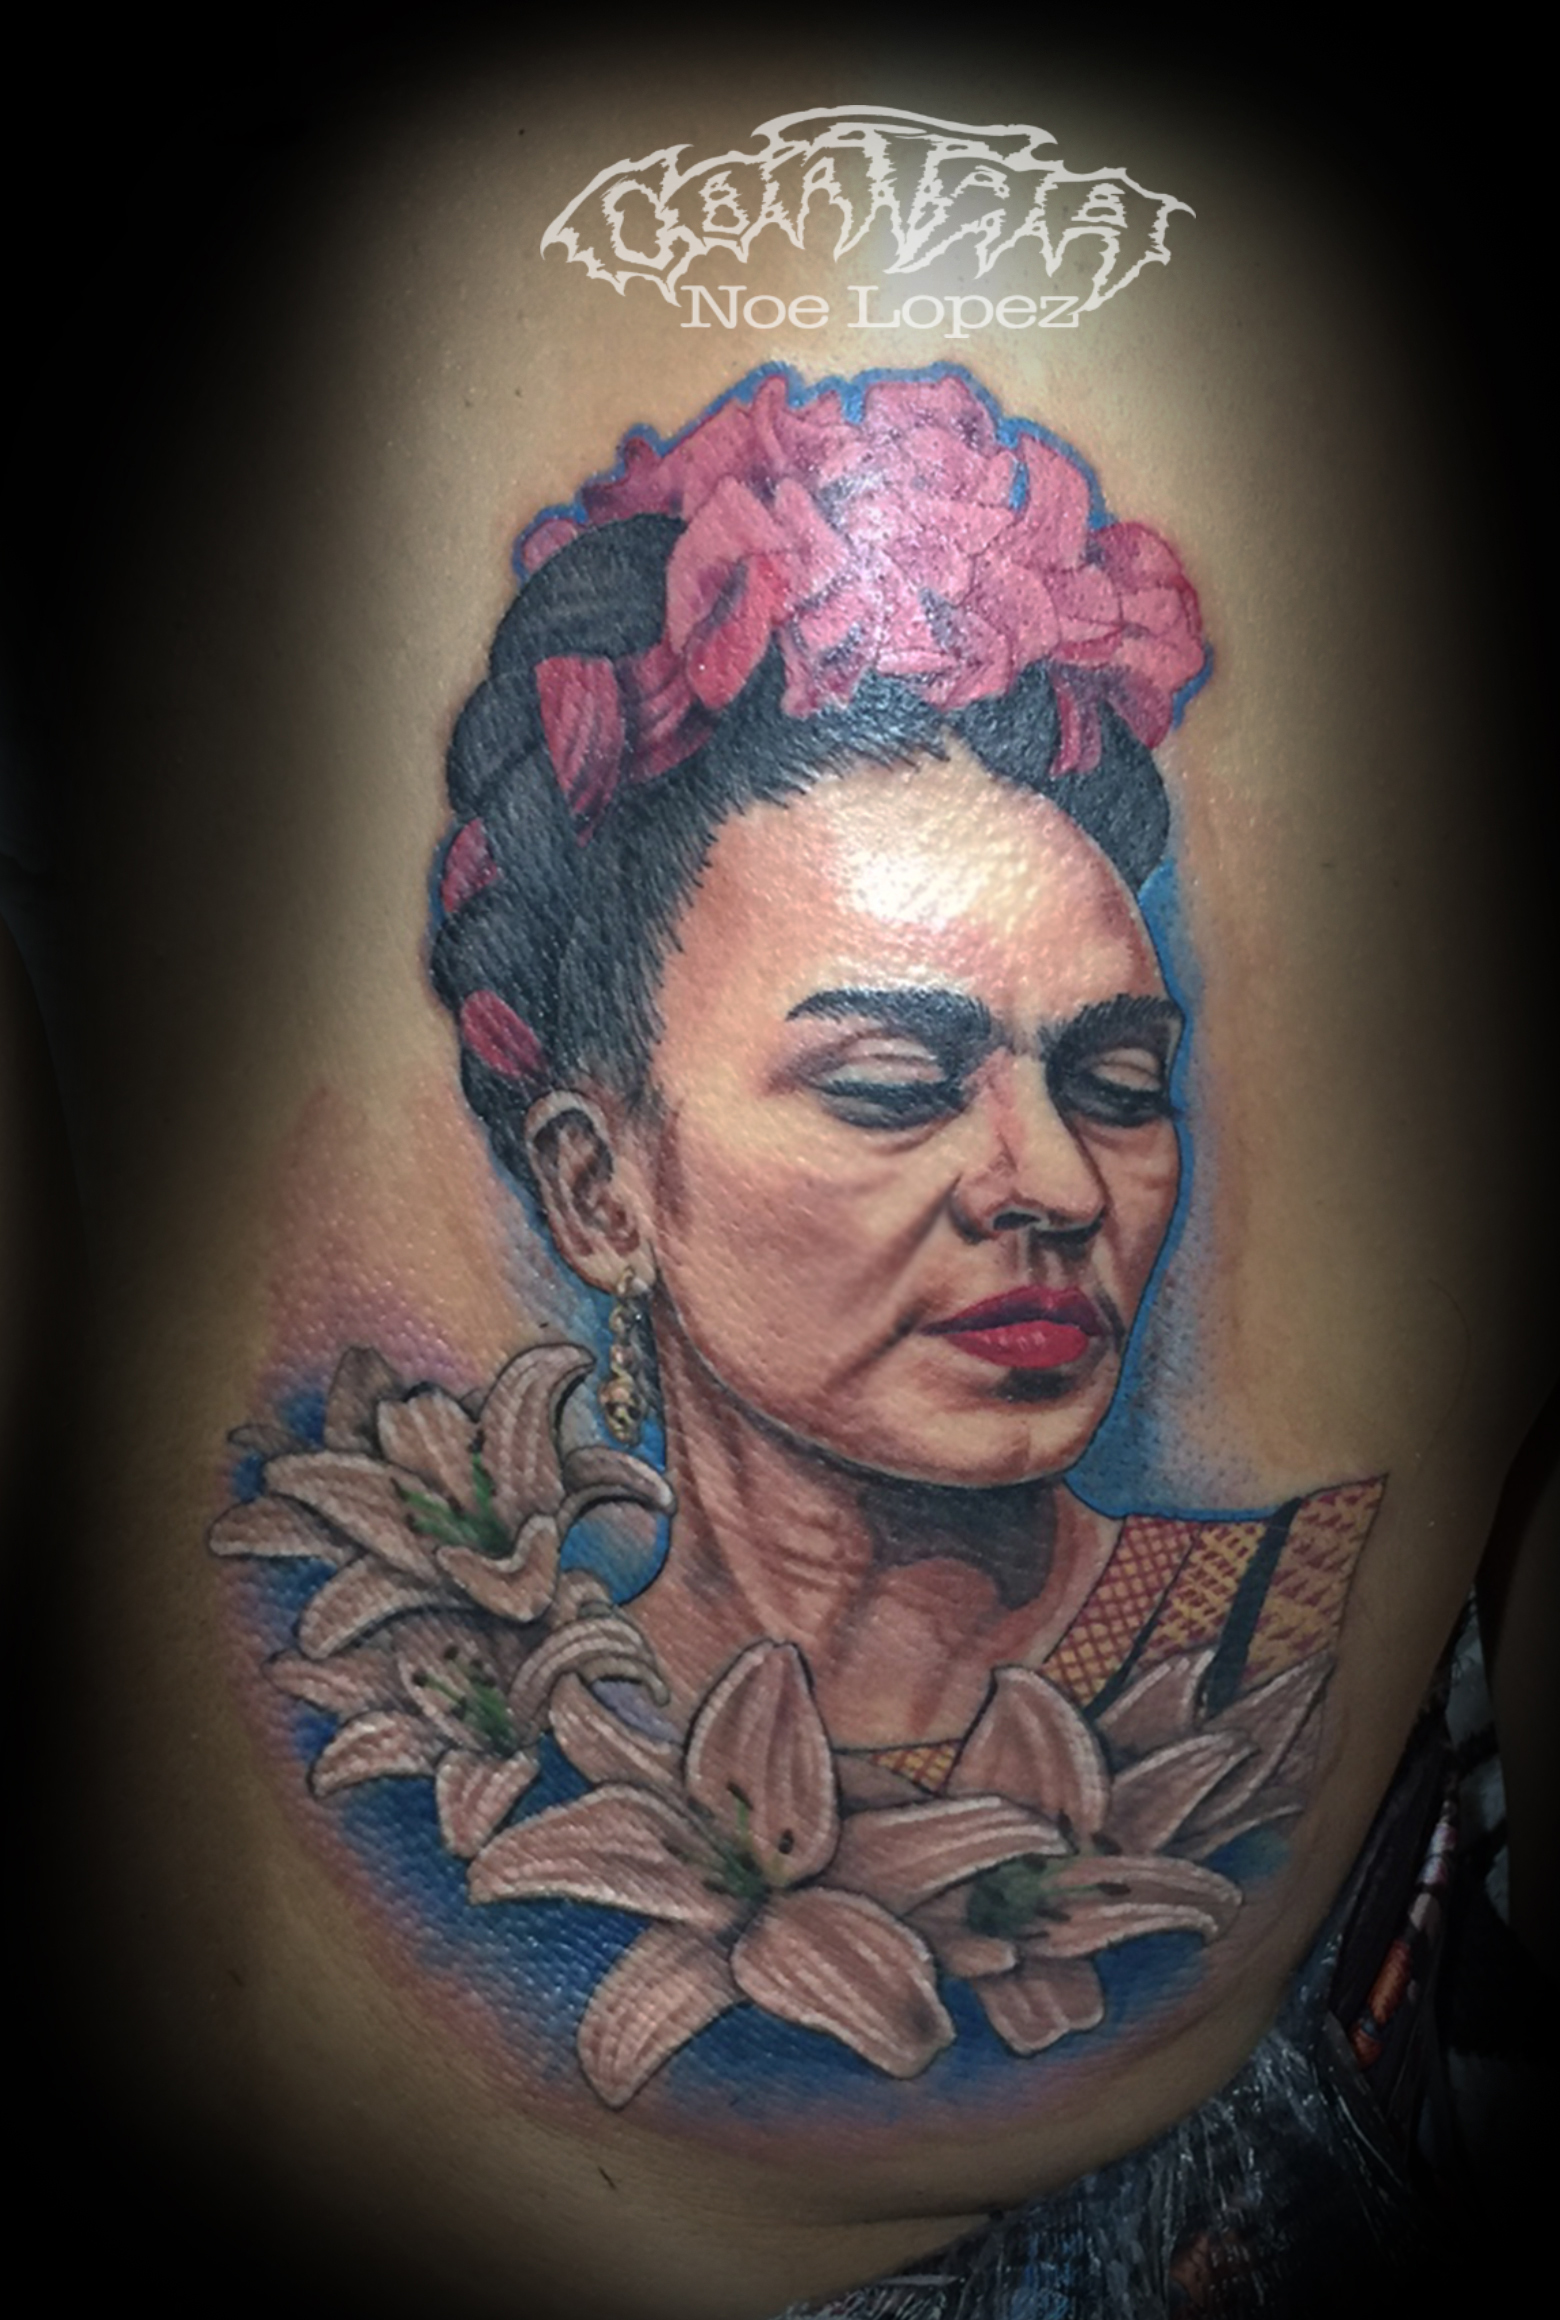 Noe Lopez Tattoos online images